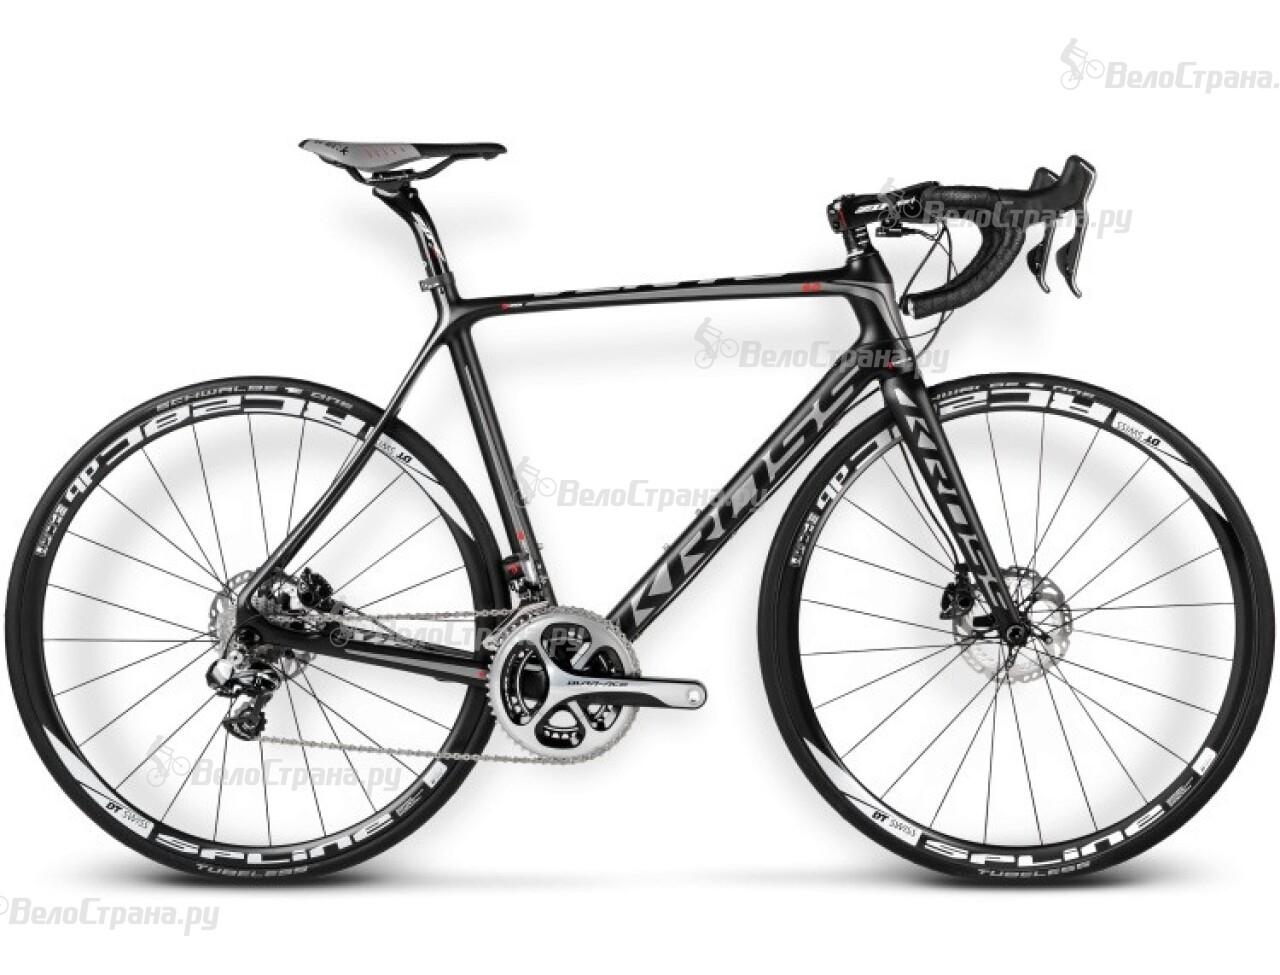 Велосипед Kross VENTO 9.0 (2016) велосипед kross inzai 2016